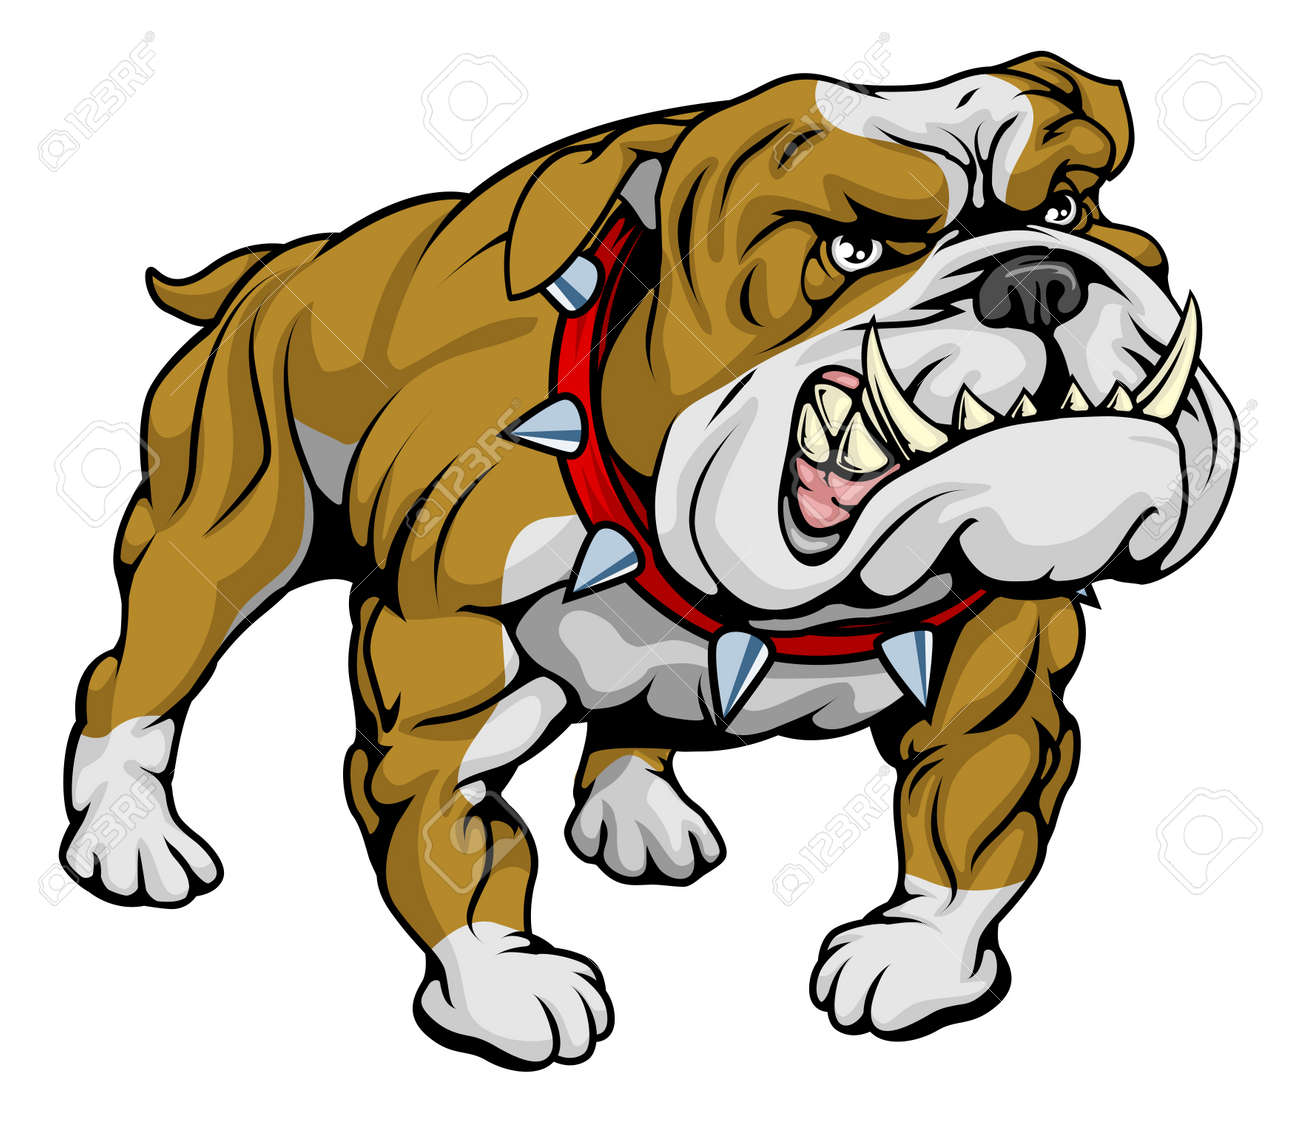 A cartoon very hard looking bulldog character. Stock Vector - 10483263